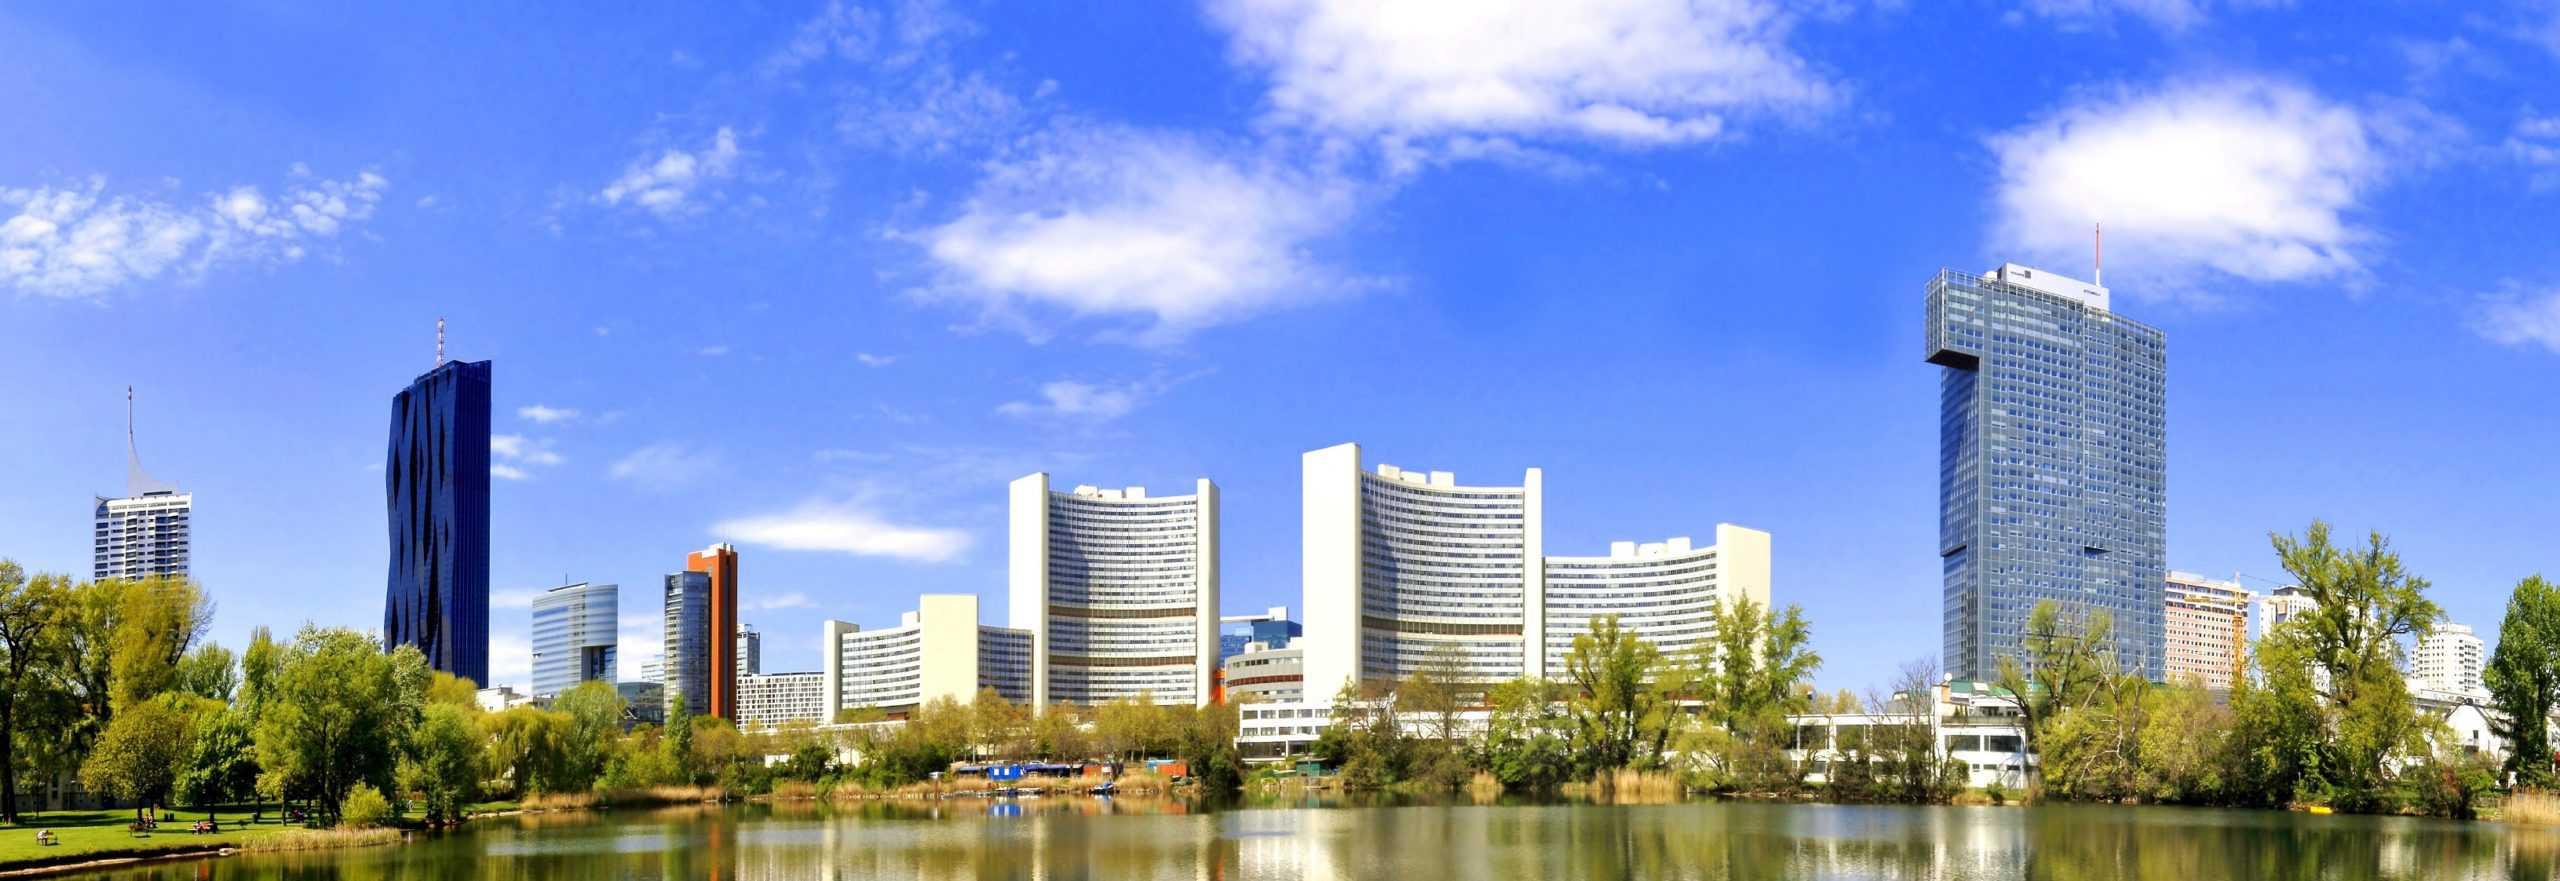 04/24/2018 Vienna, Austria Panorama of UNO-City at Lake Alte Donau and blue sky